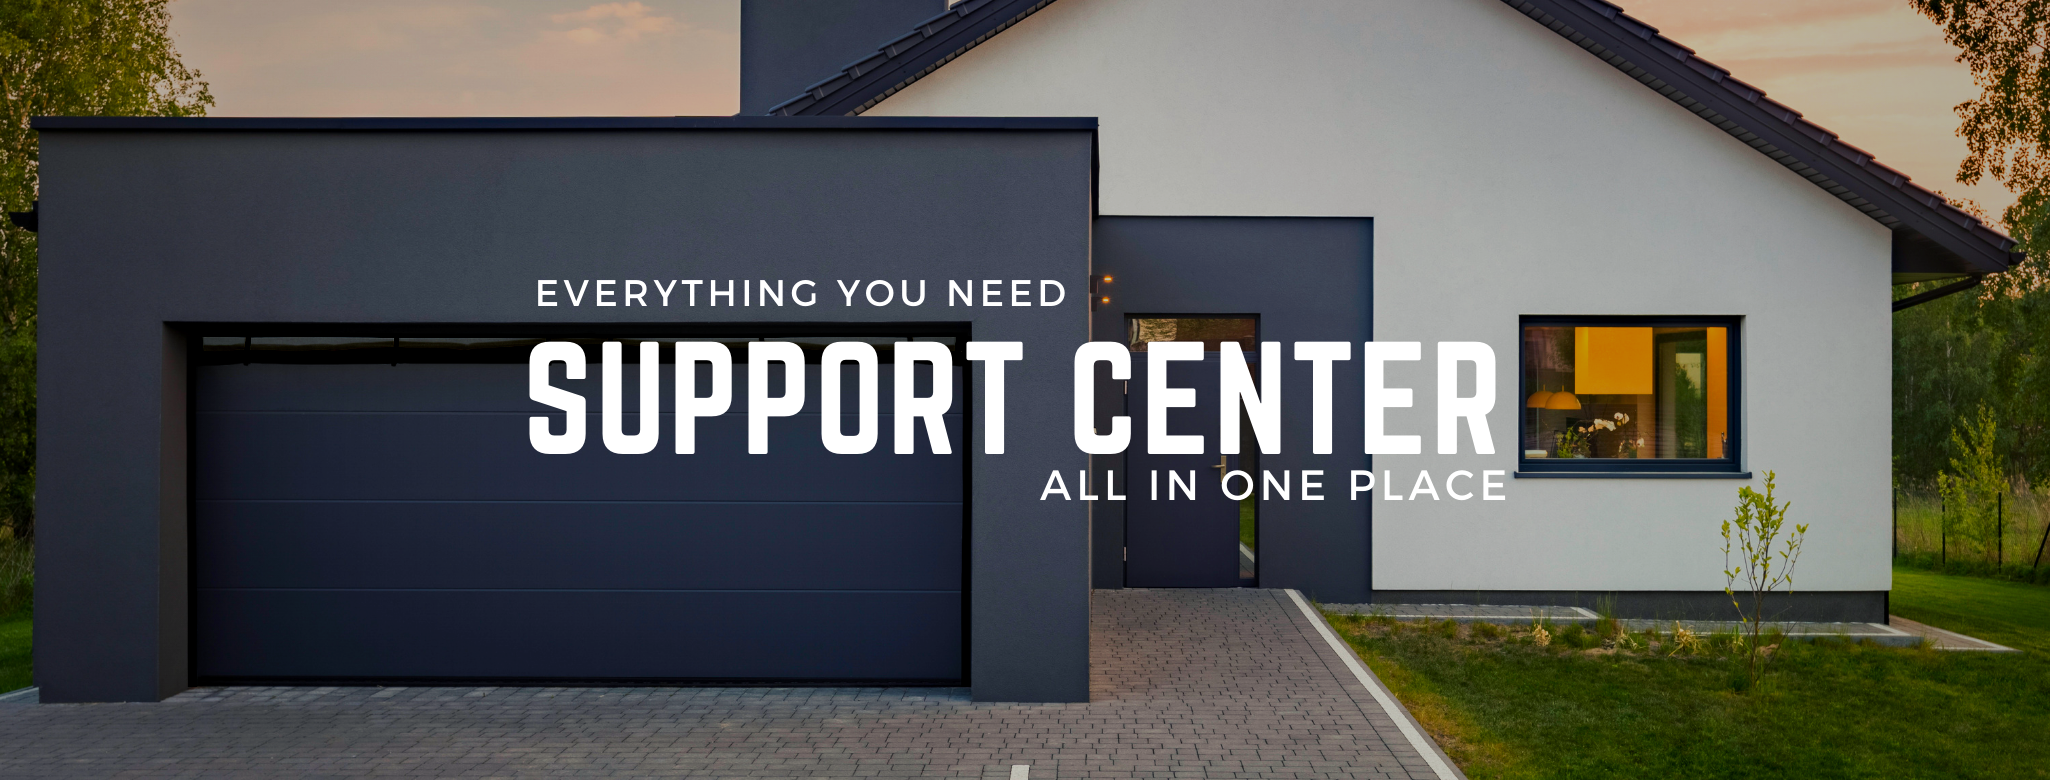 Support Center Banner